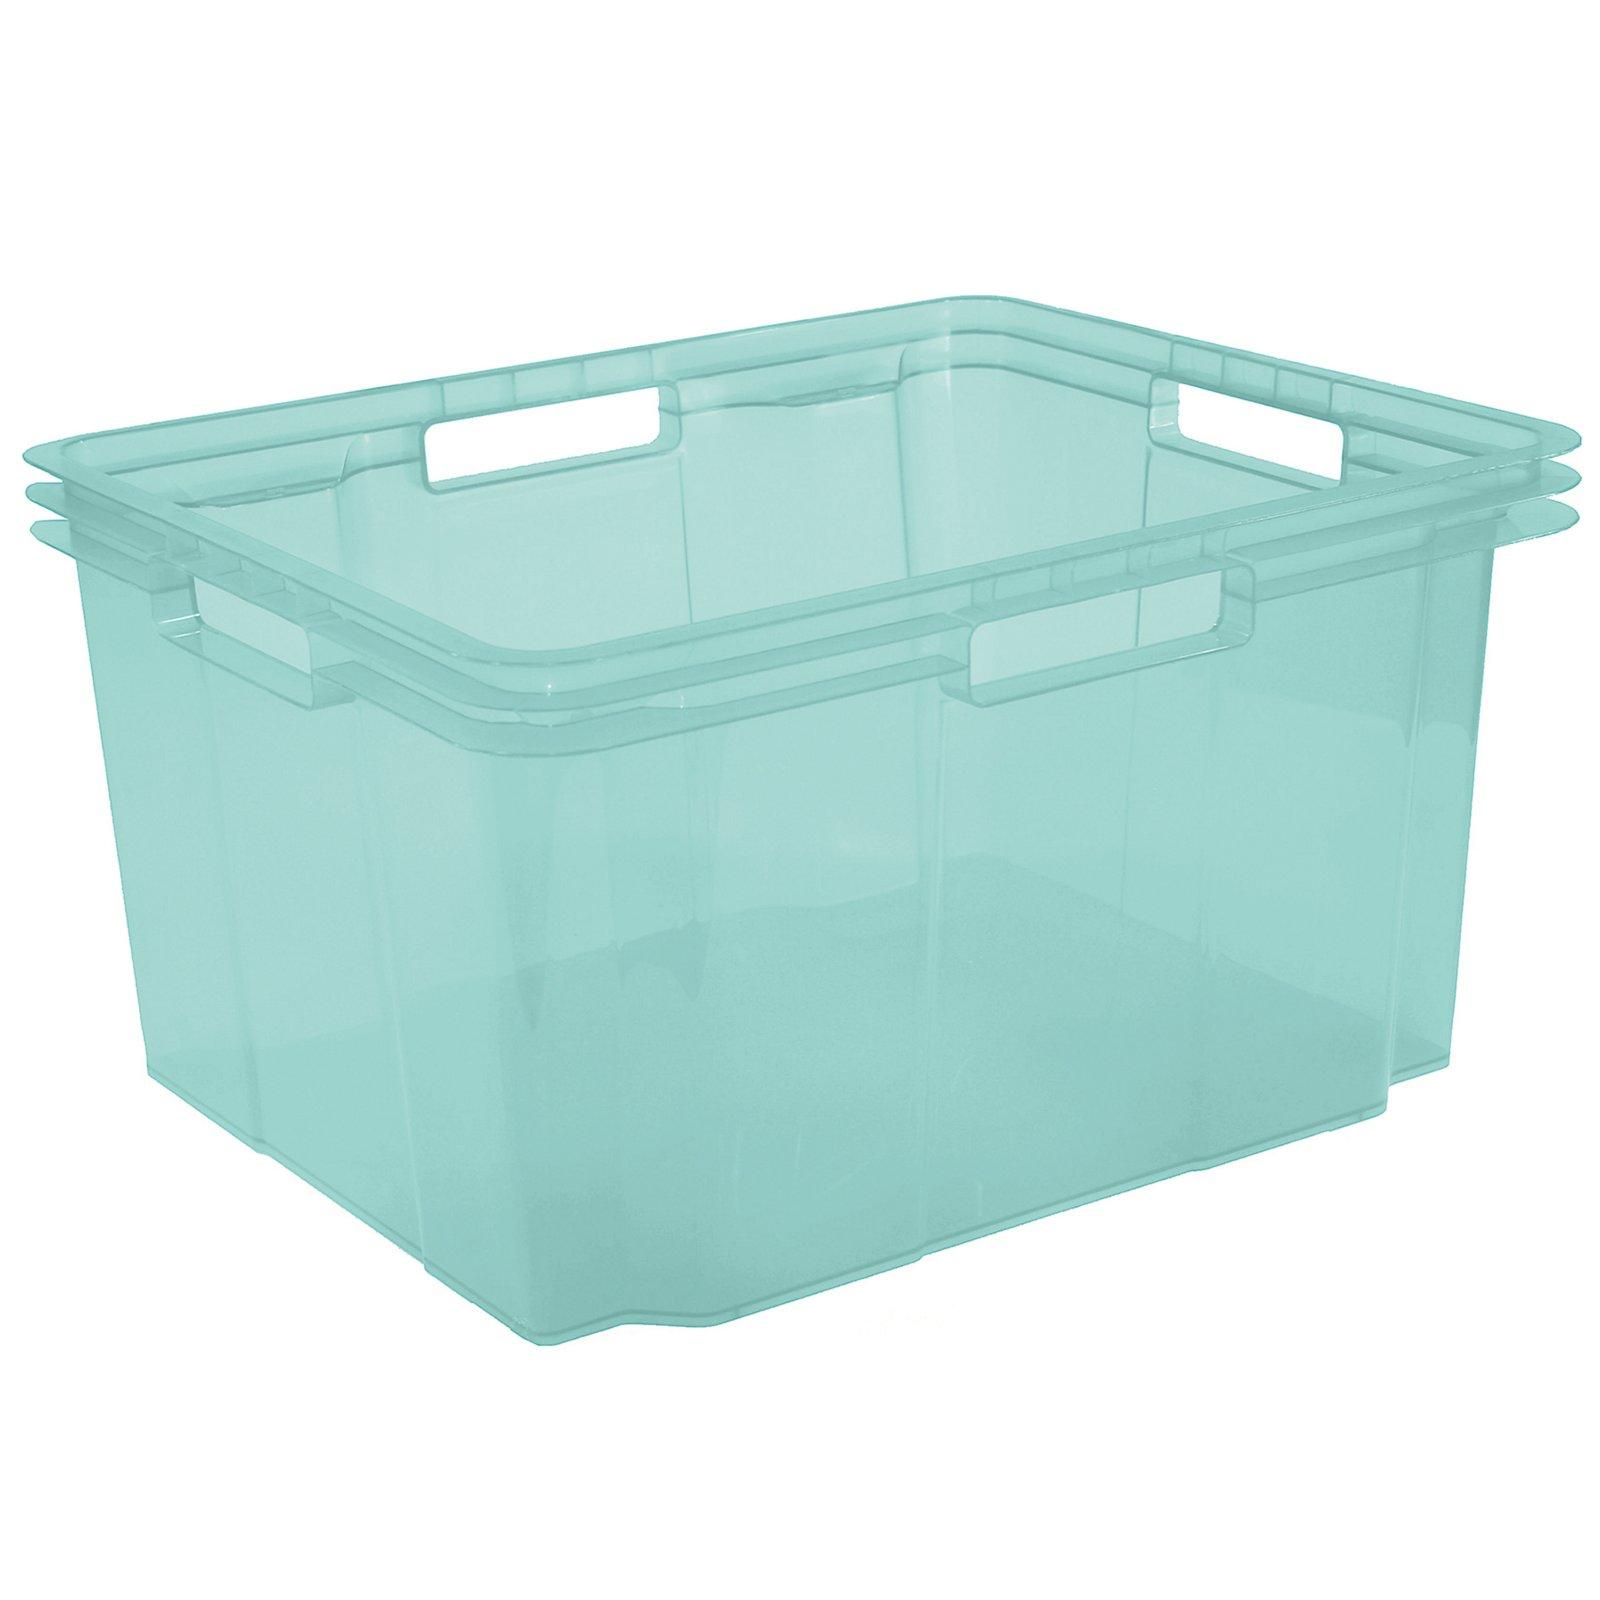 Stapelbox - türkis pastell - 26 Liter